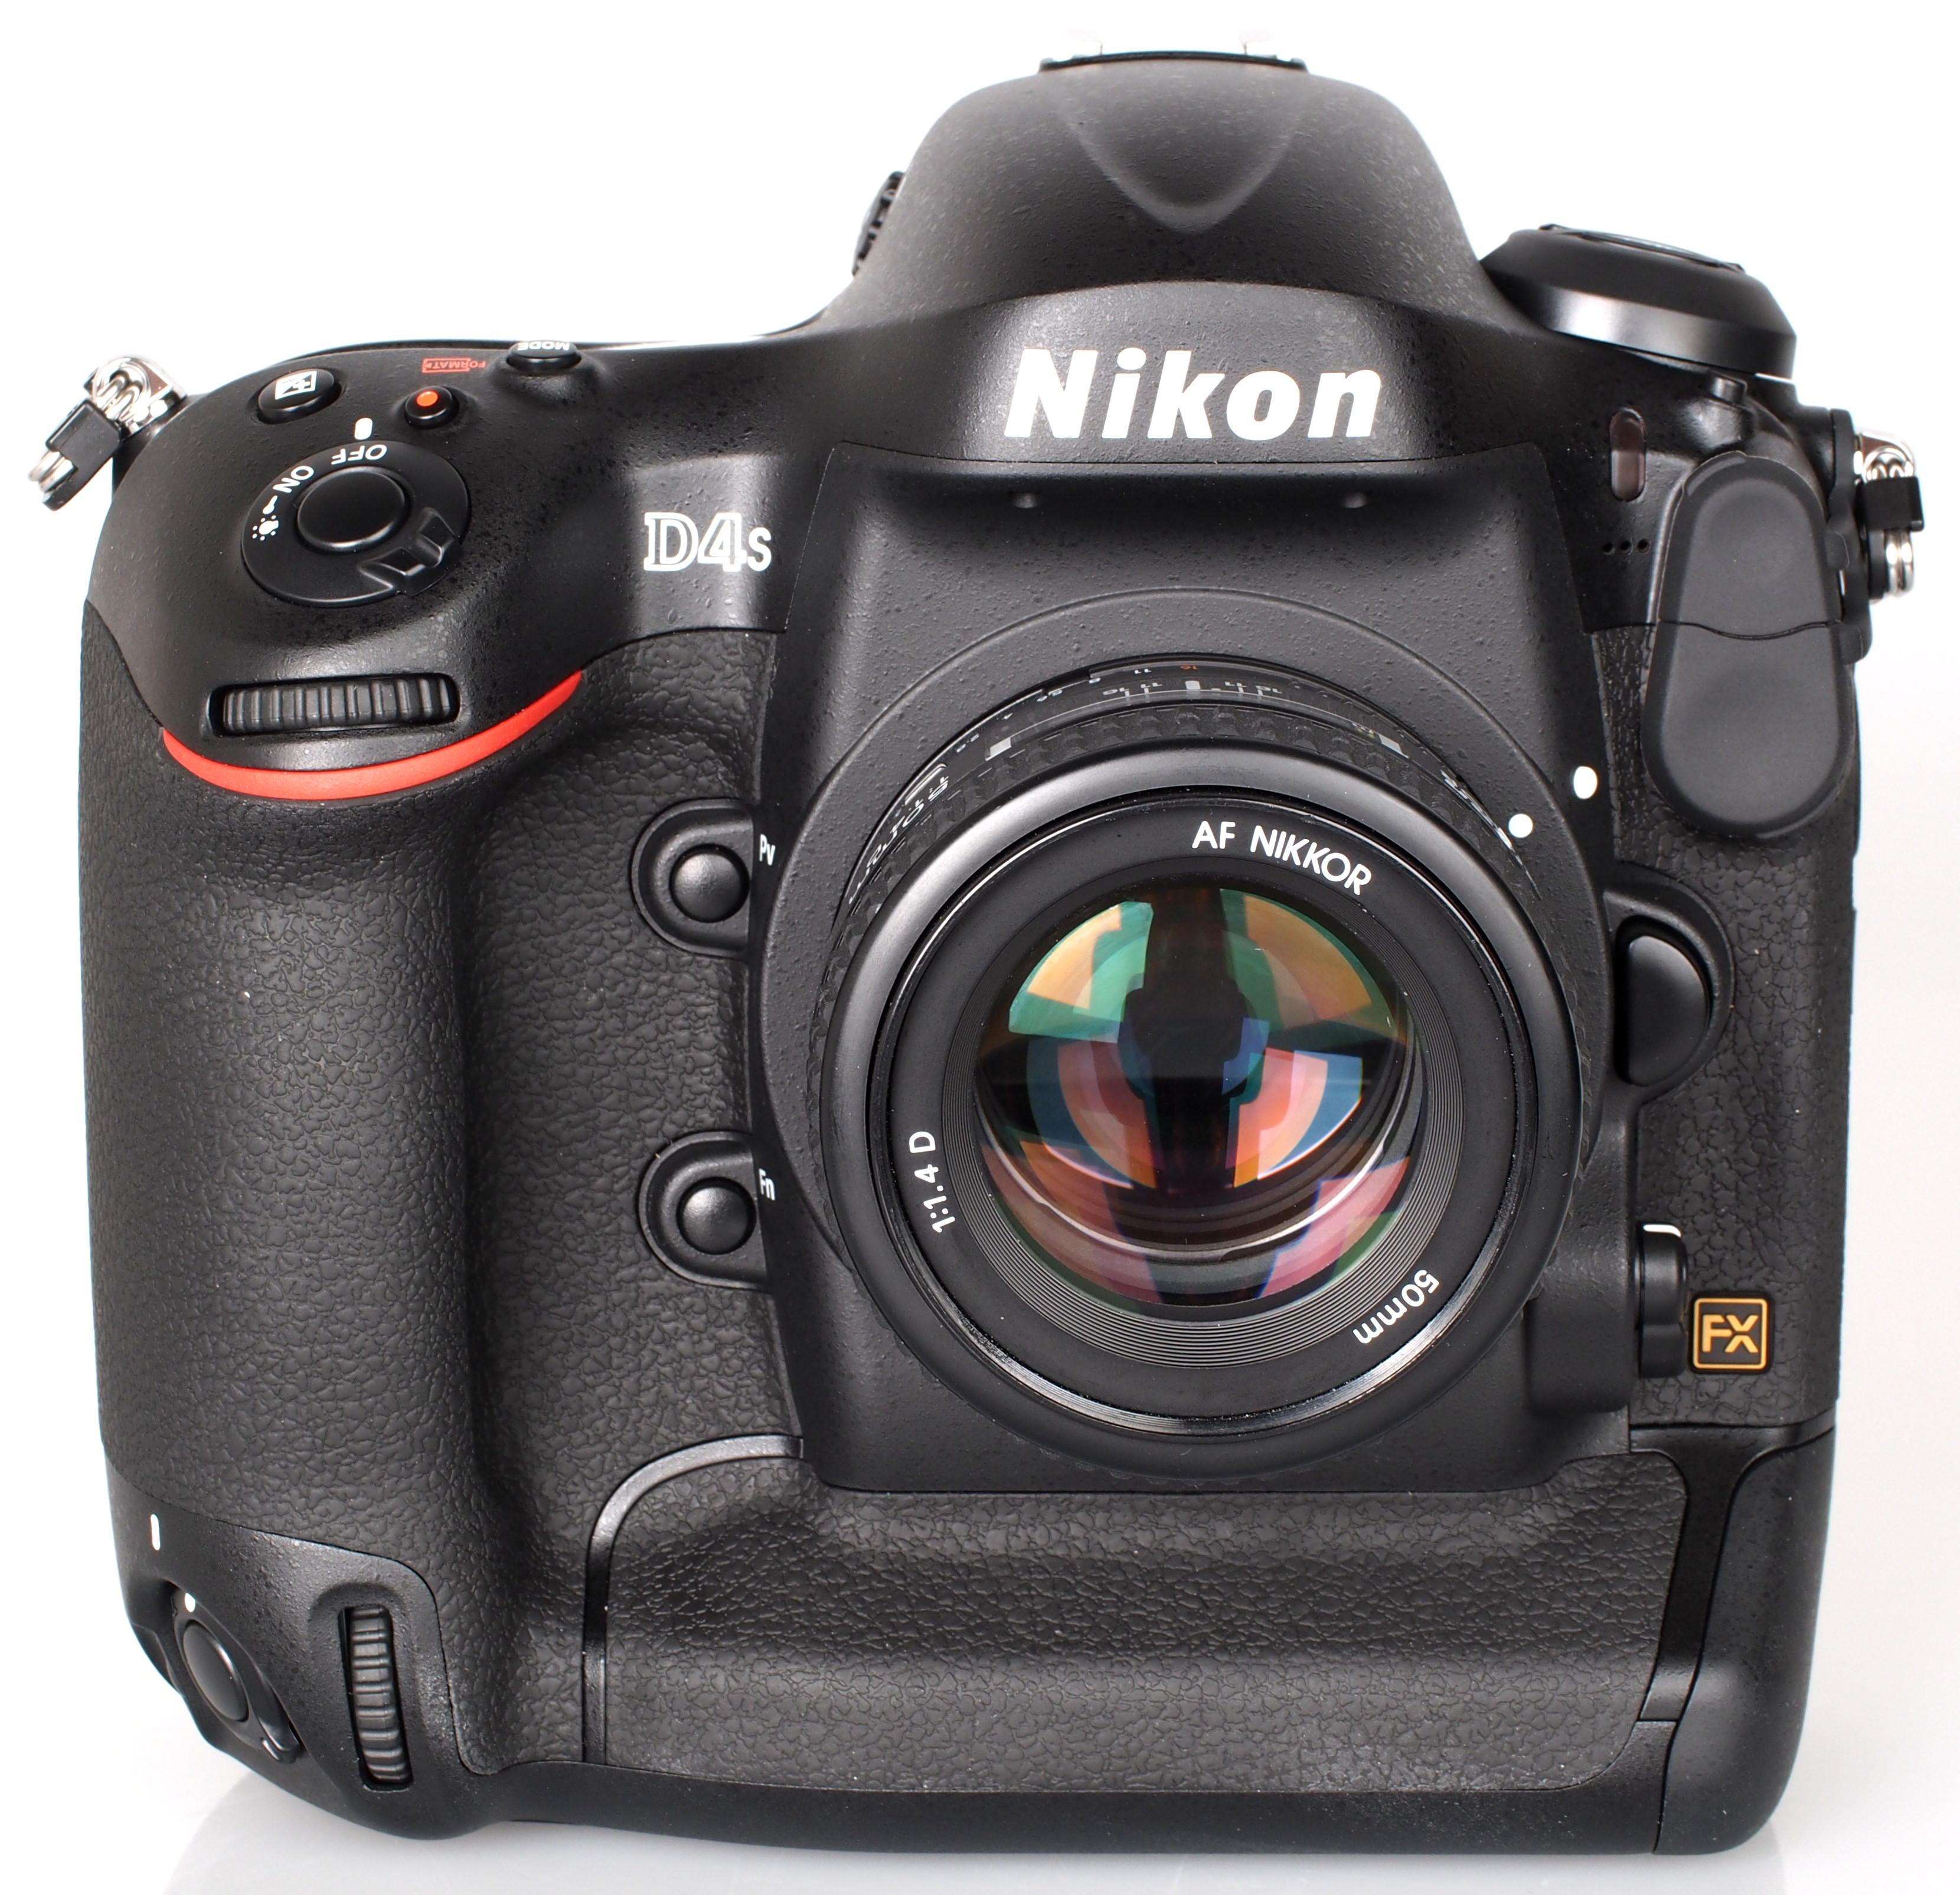 Nikon D4S Wins European Professional DSLR Camera 2014-2015